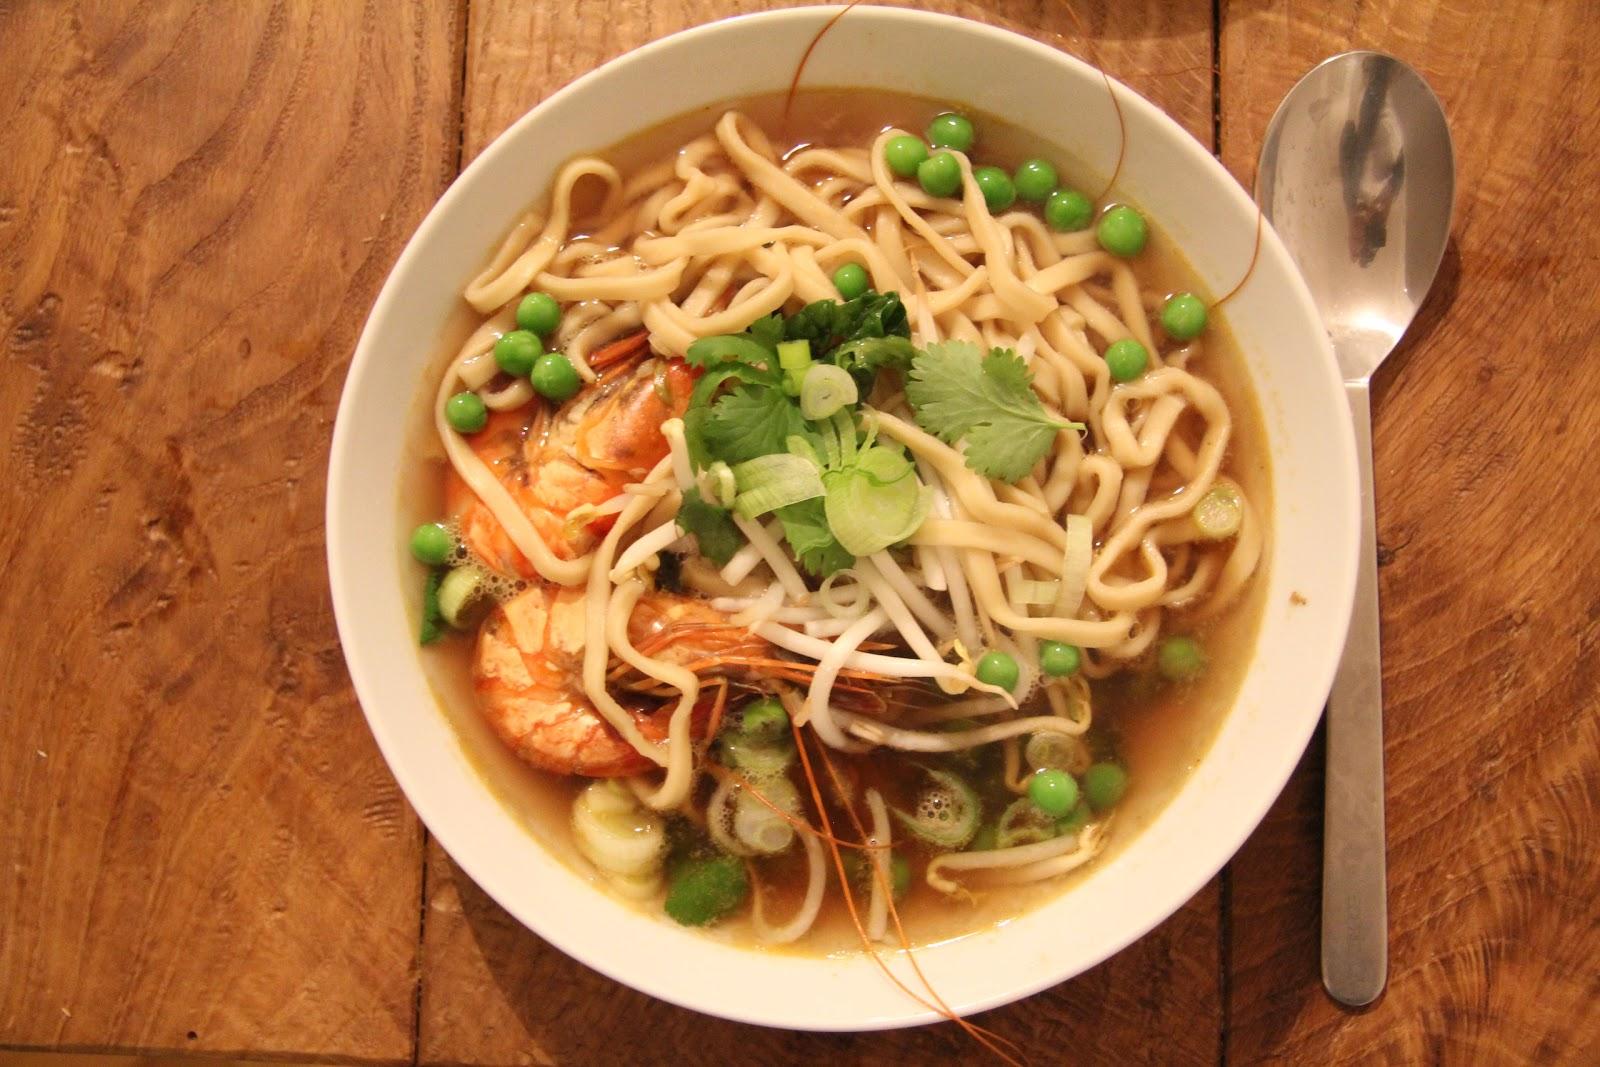 asiatische garnelen suppe last kitchen hero. Black Bedroom Furniture Sets. Home Design Ideas